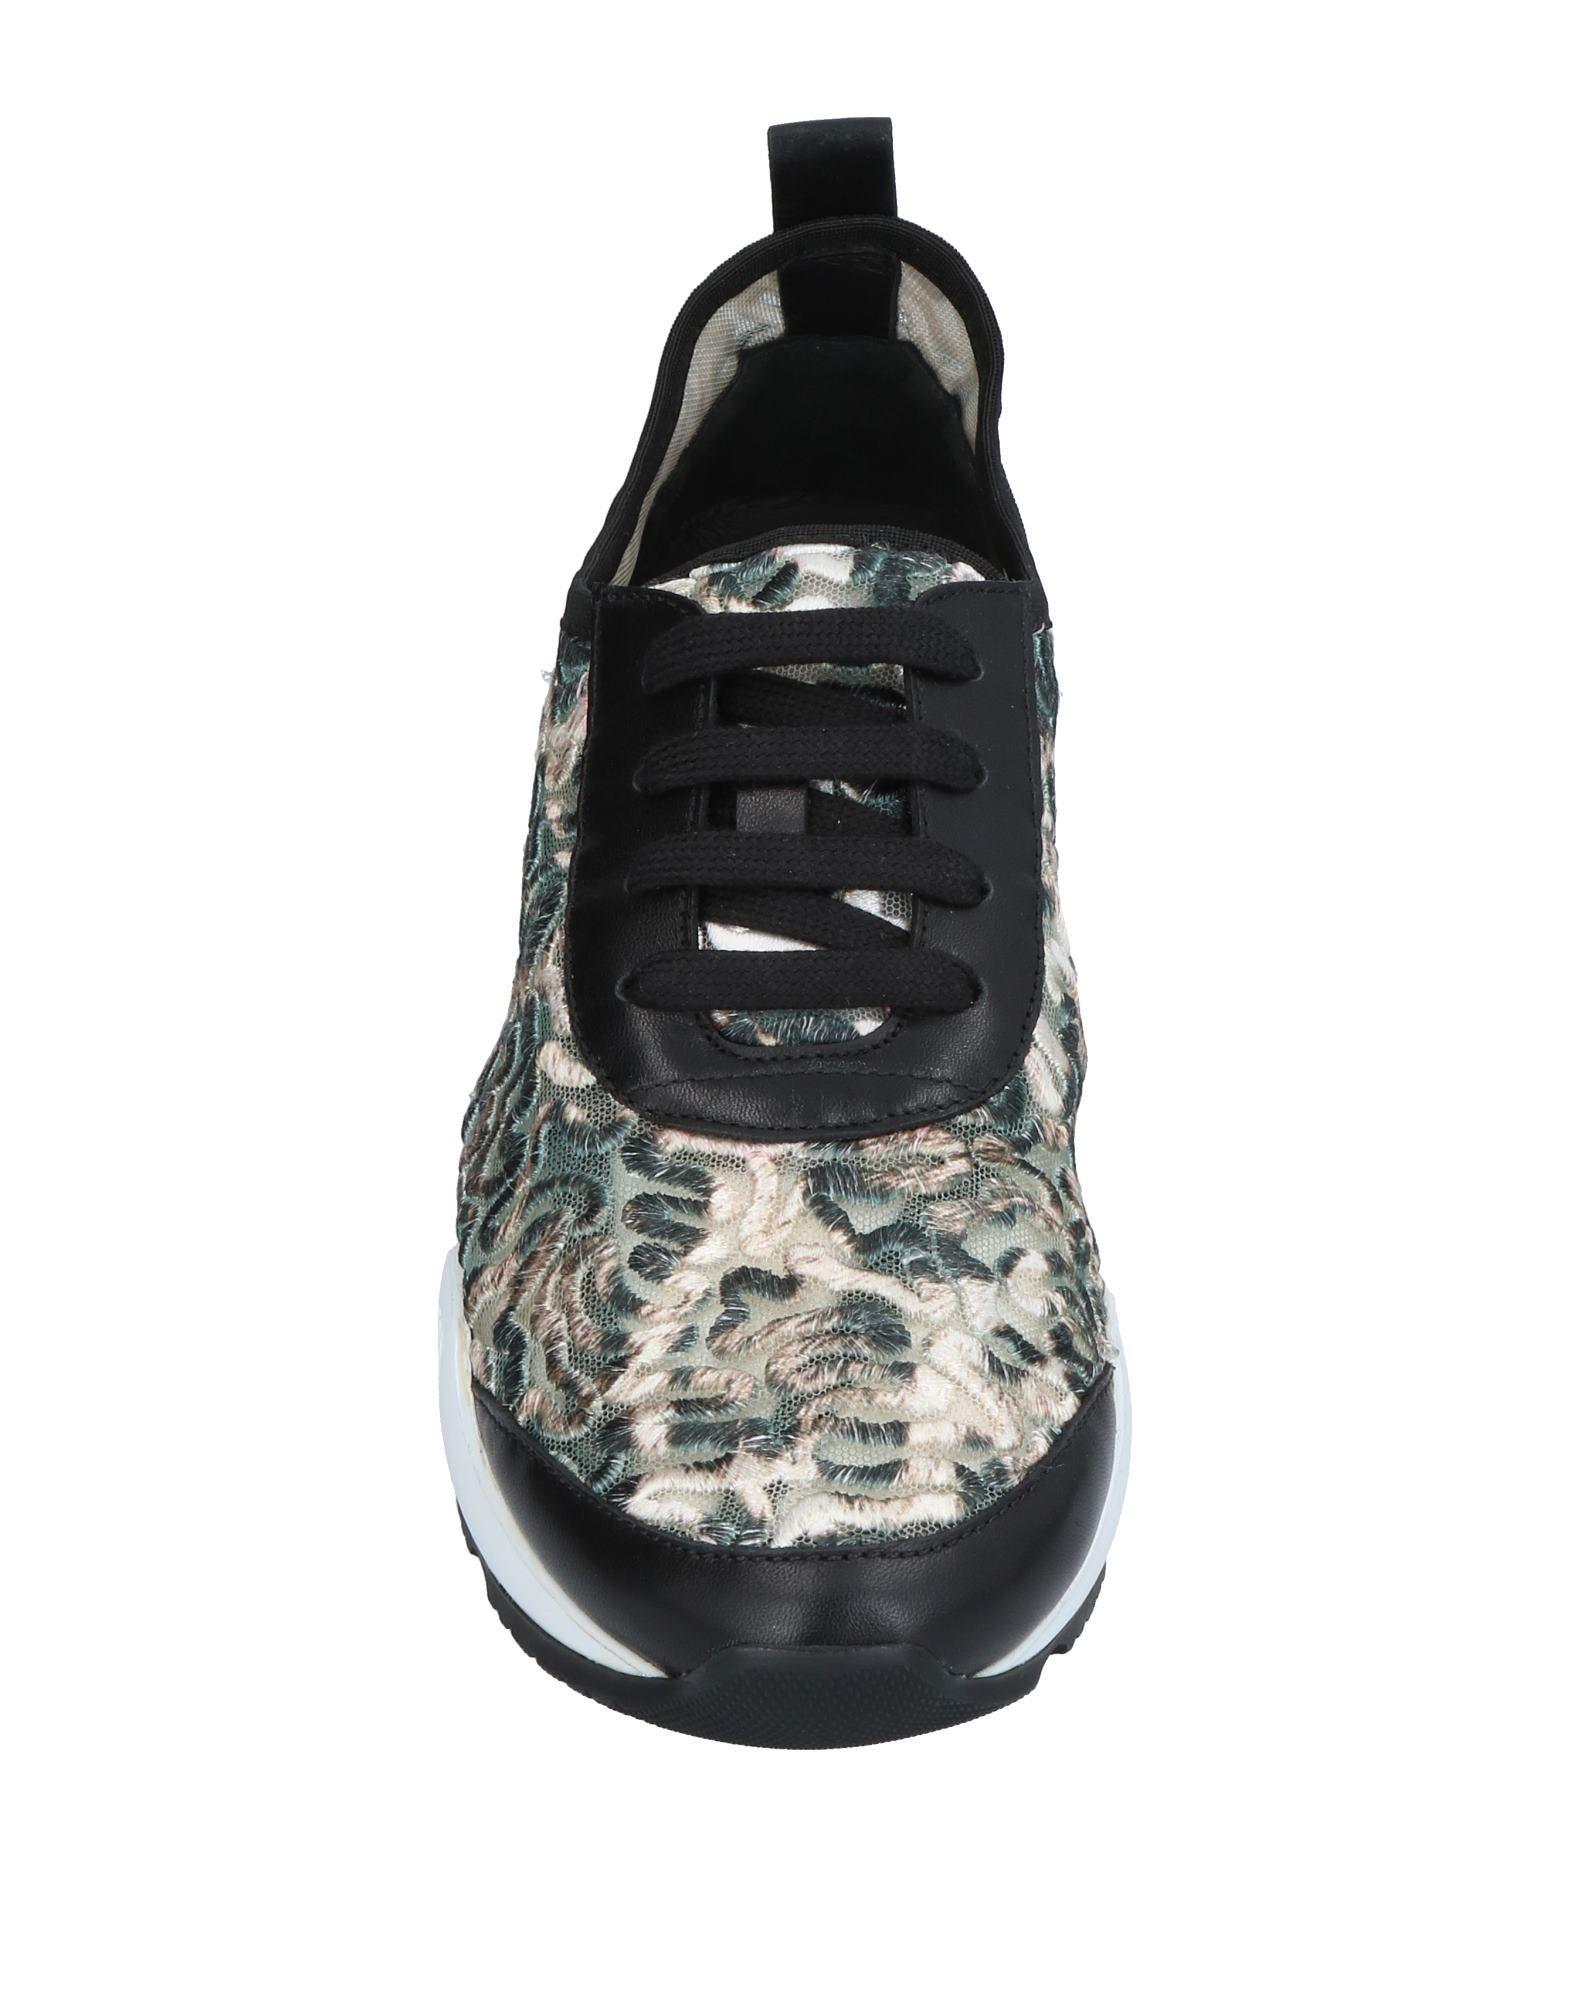 Sneakers Ermanno Scervino Femme - Sneakers Ermanno Scervino sur